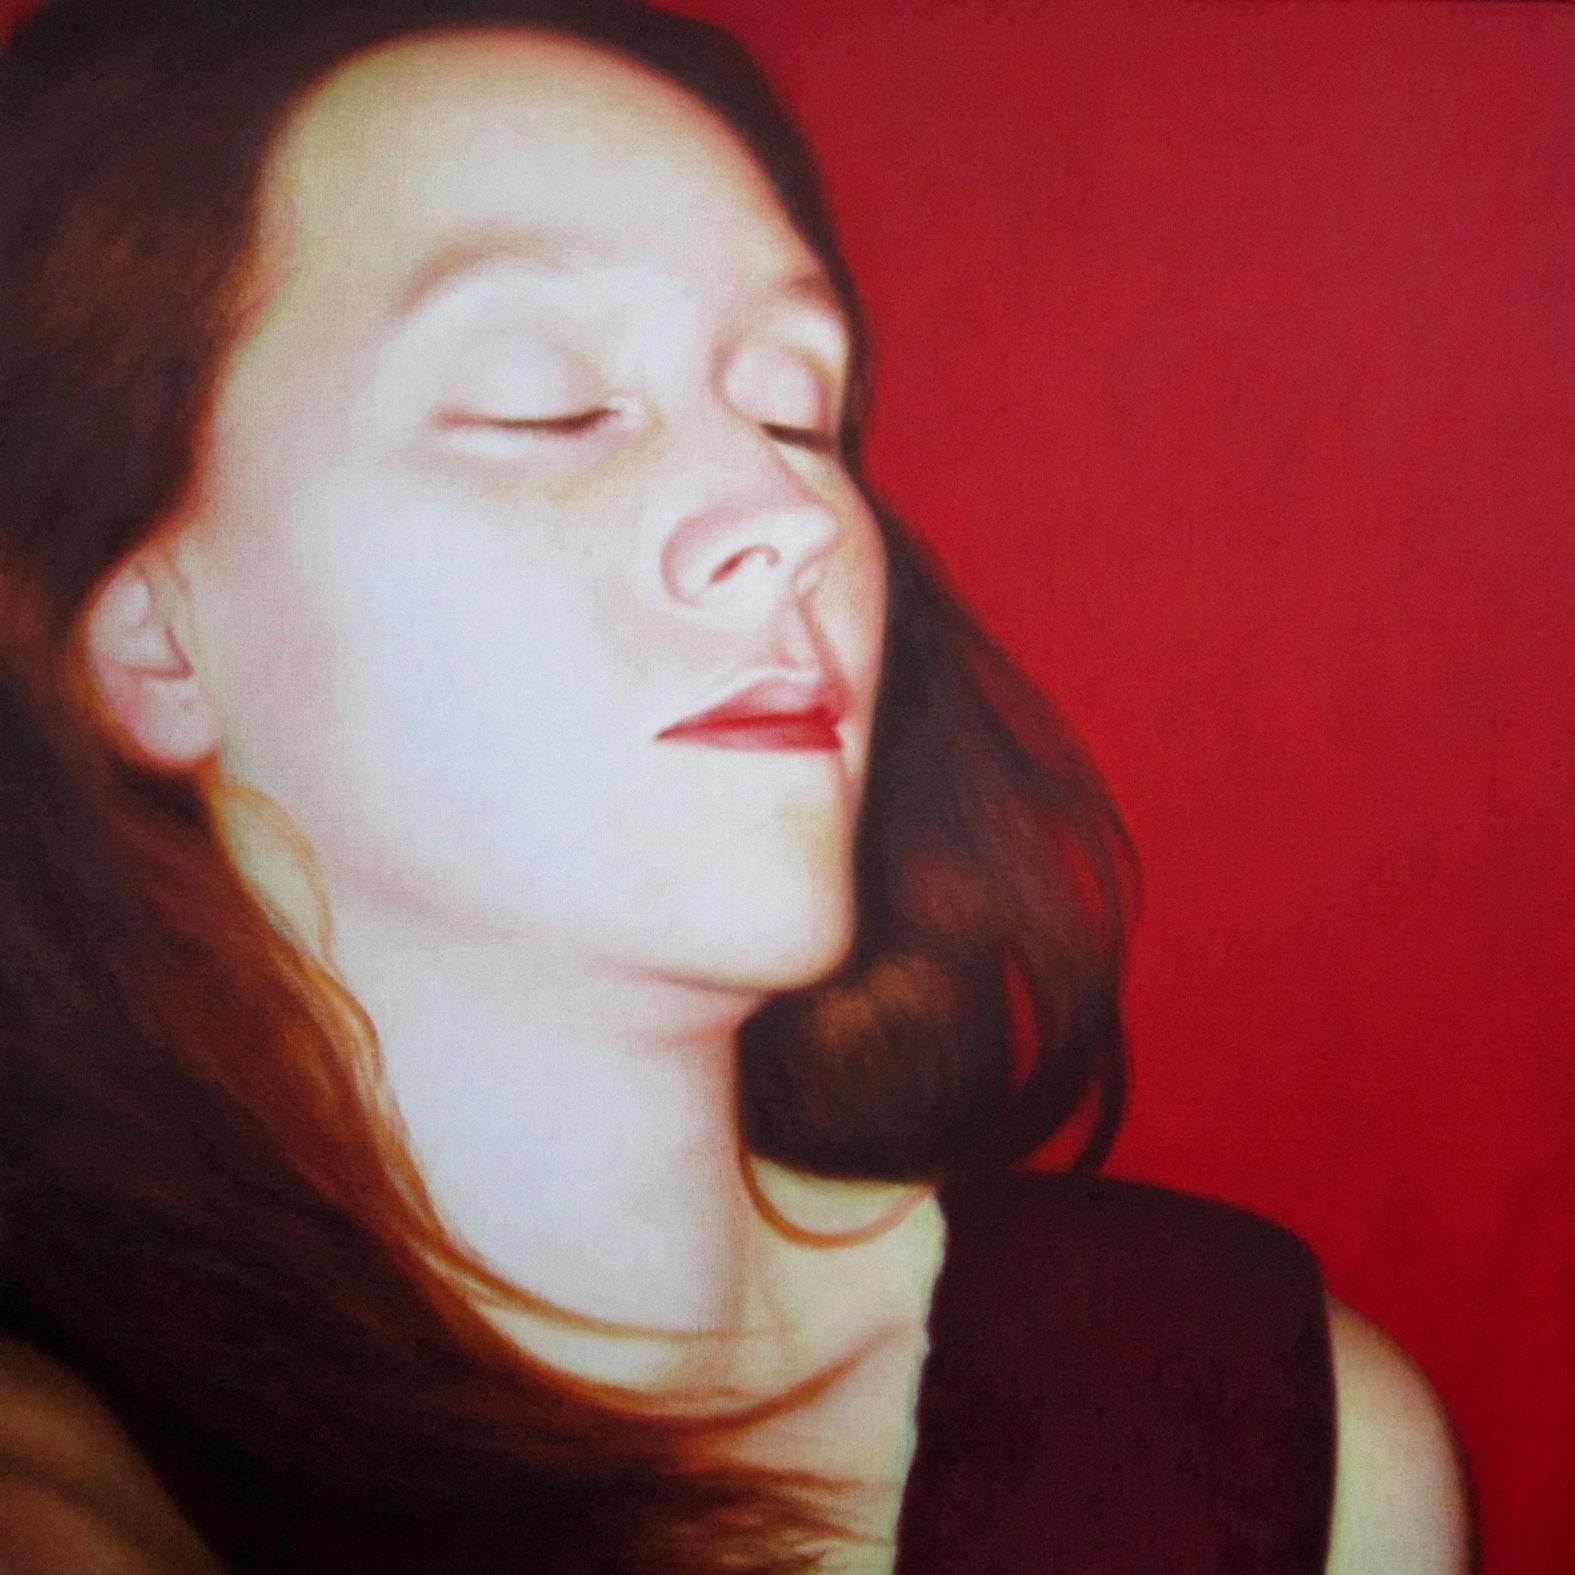 Lique Schoot, Self-portrait 09 08 02